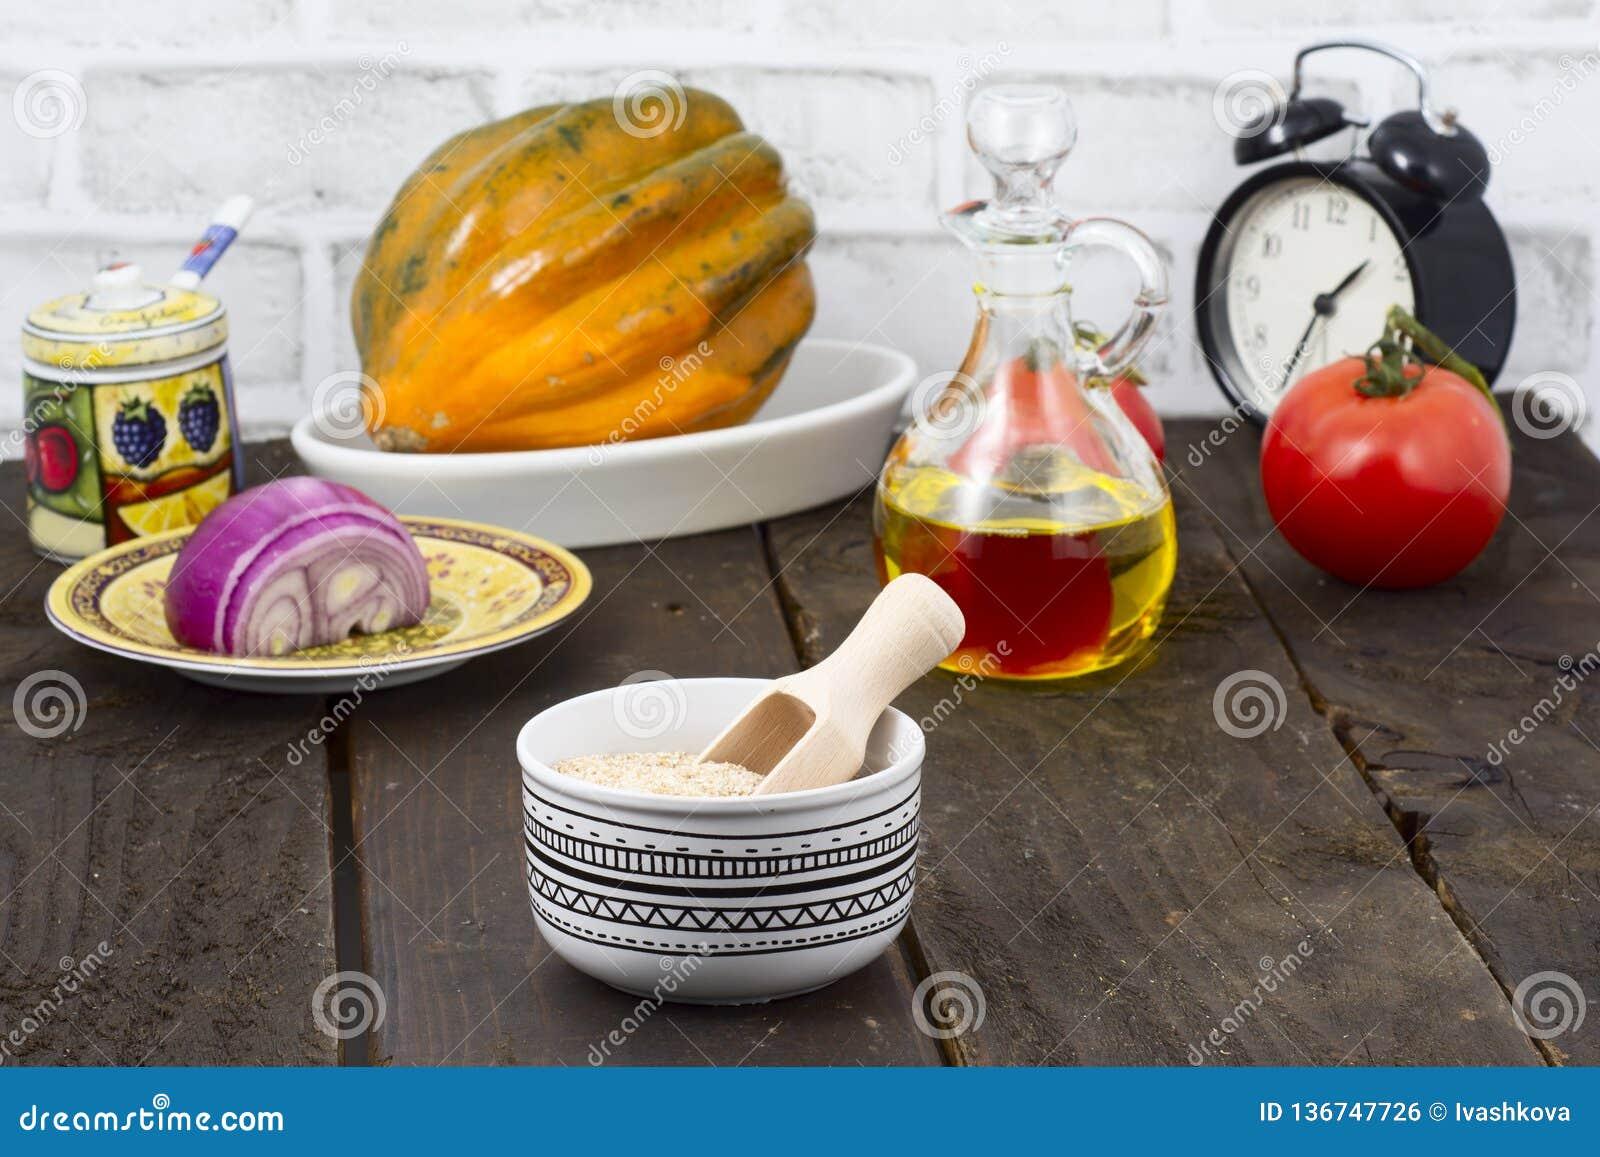 Bulgur and vegetables